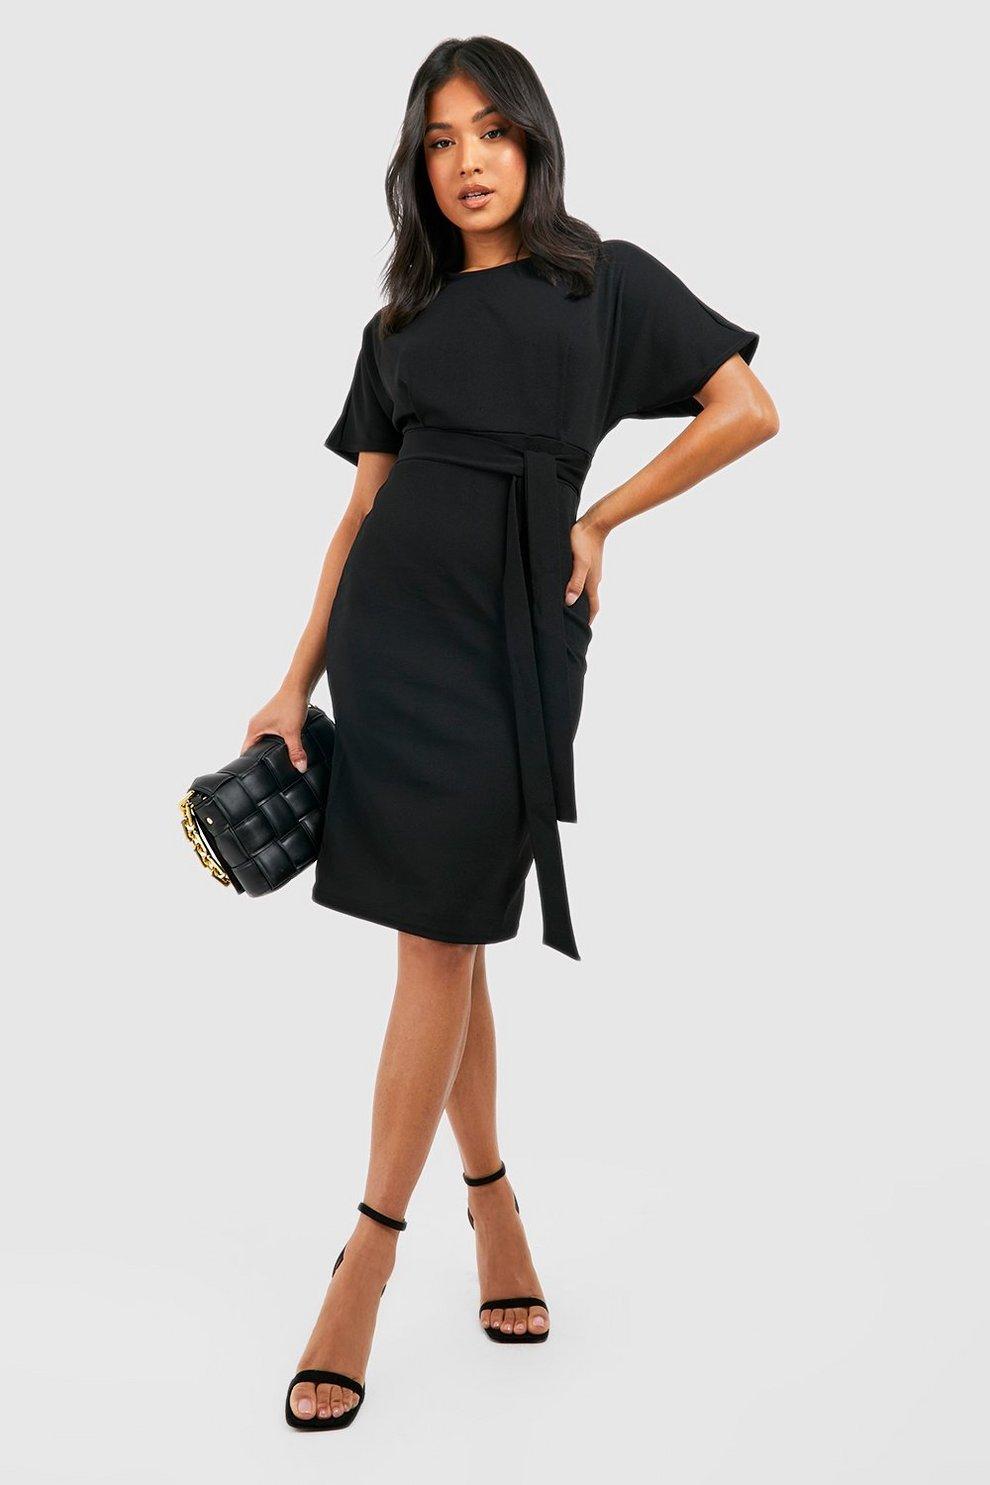 a28daadbf0c1 Womens Black Petite Tie Waist Formal Wiggle Midi Dress